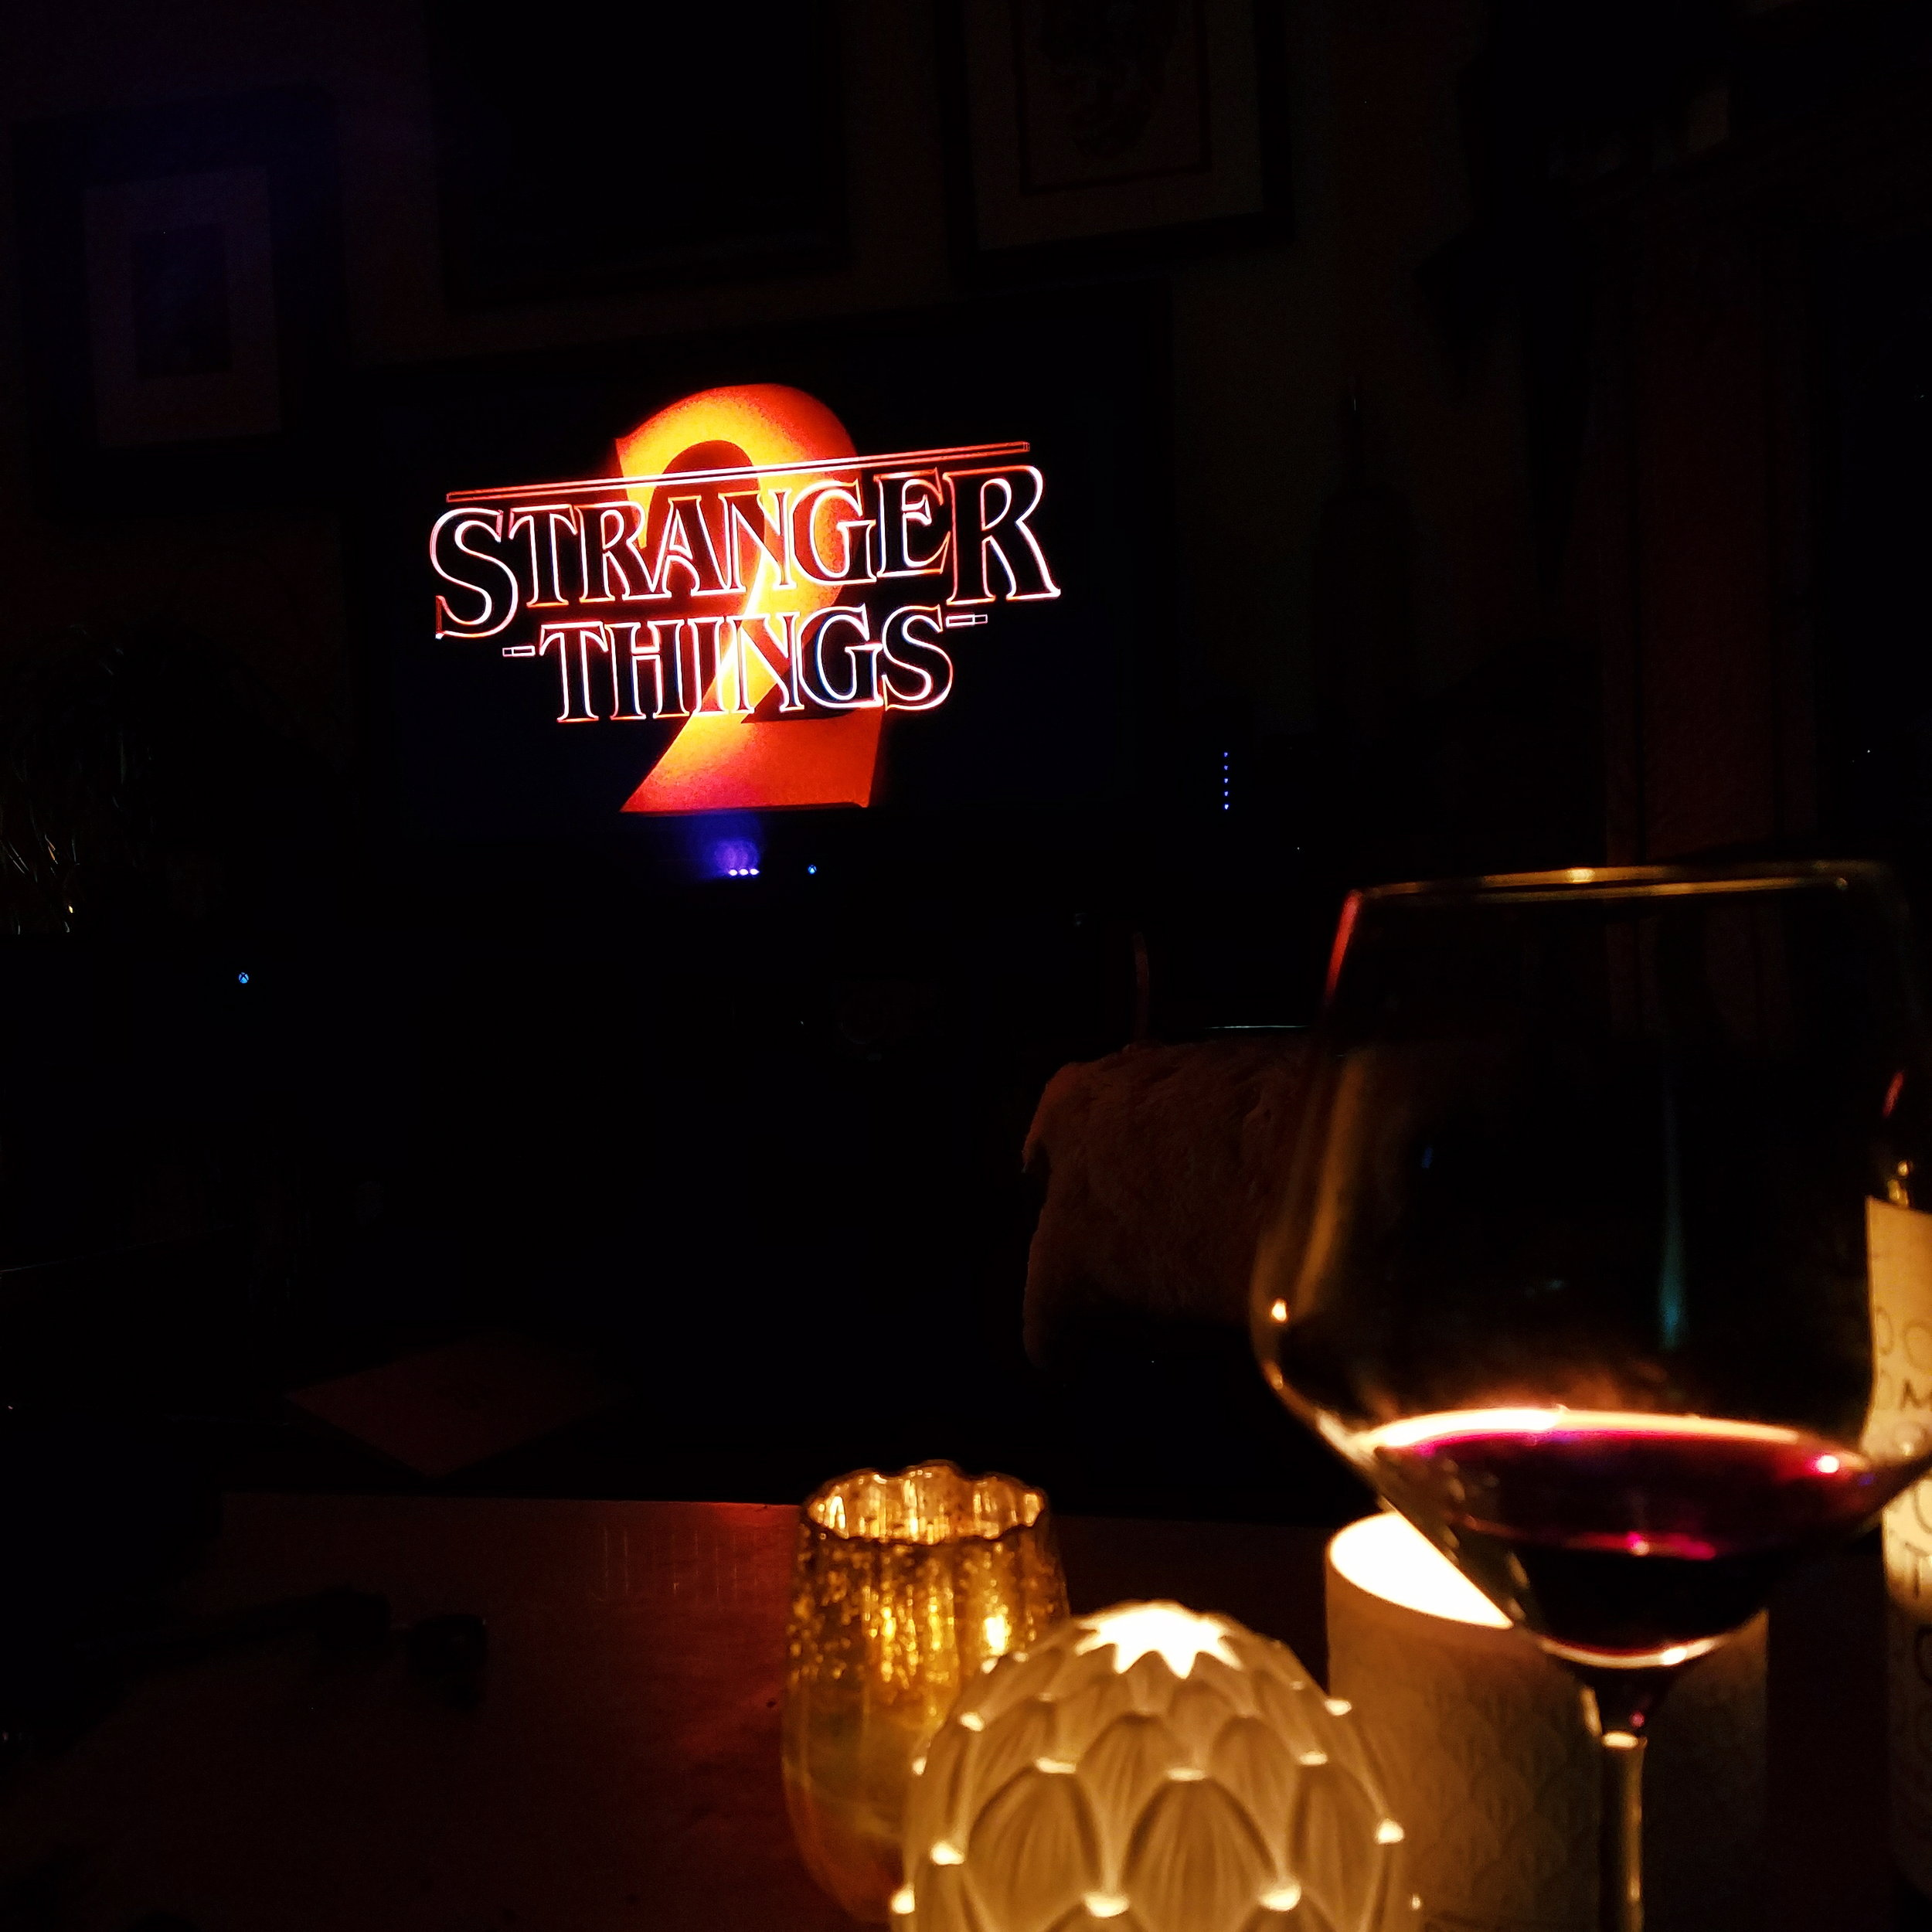 Stranger Things season 2 was  so good!!!